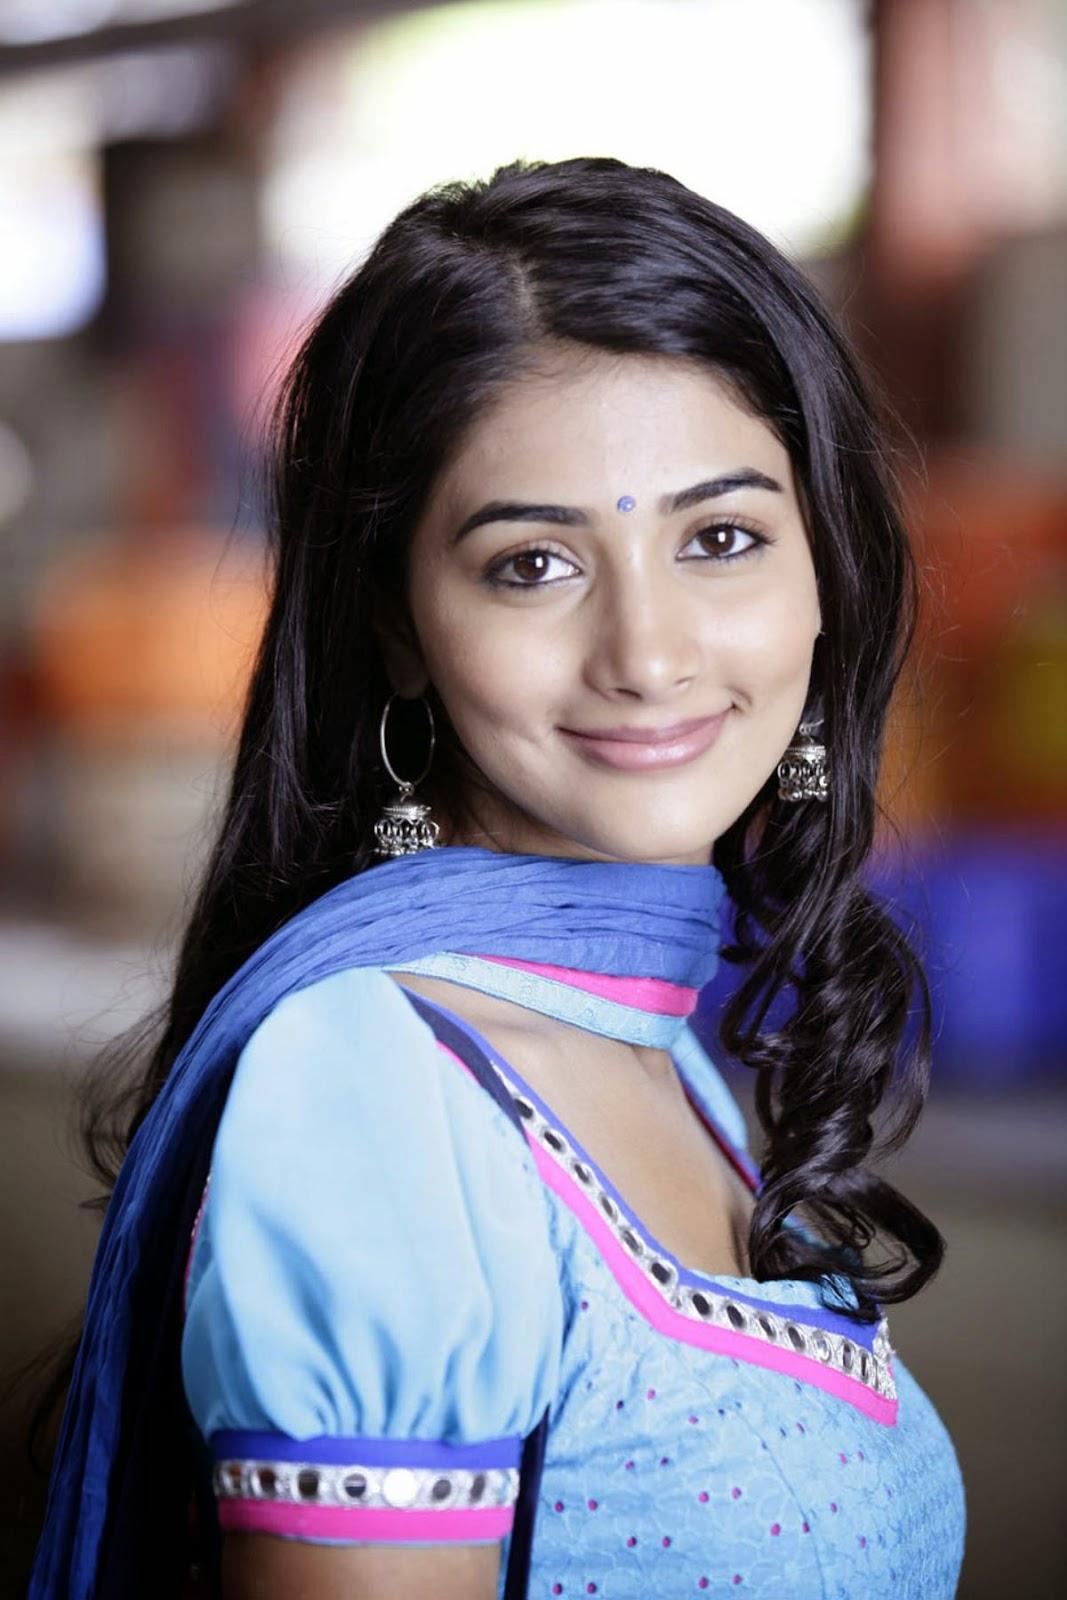 actress and model pooja hegde cute wallpapers - cap